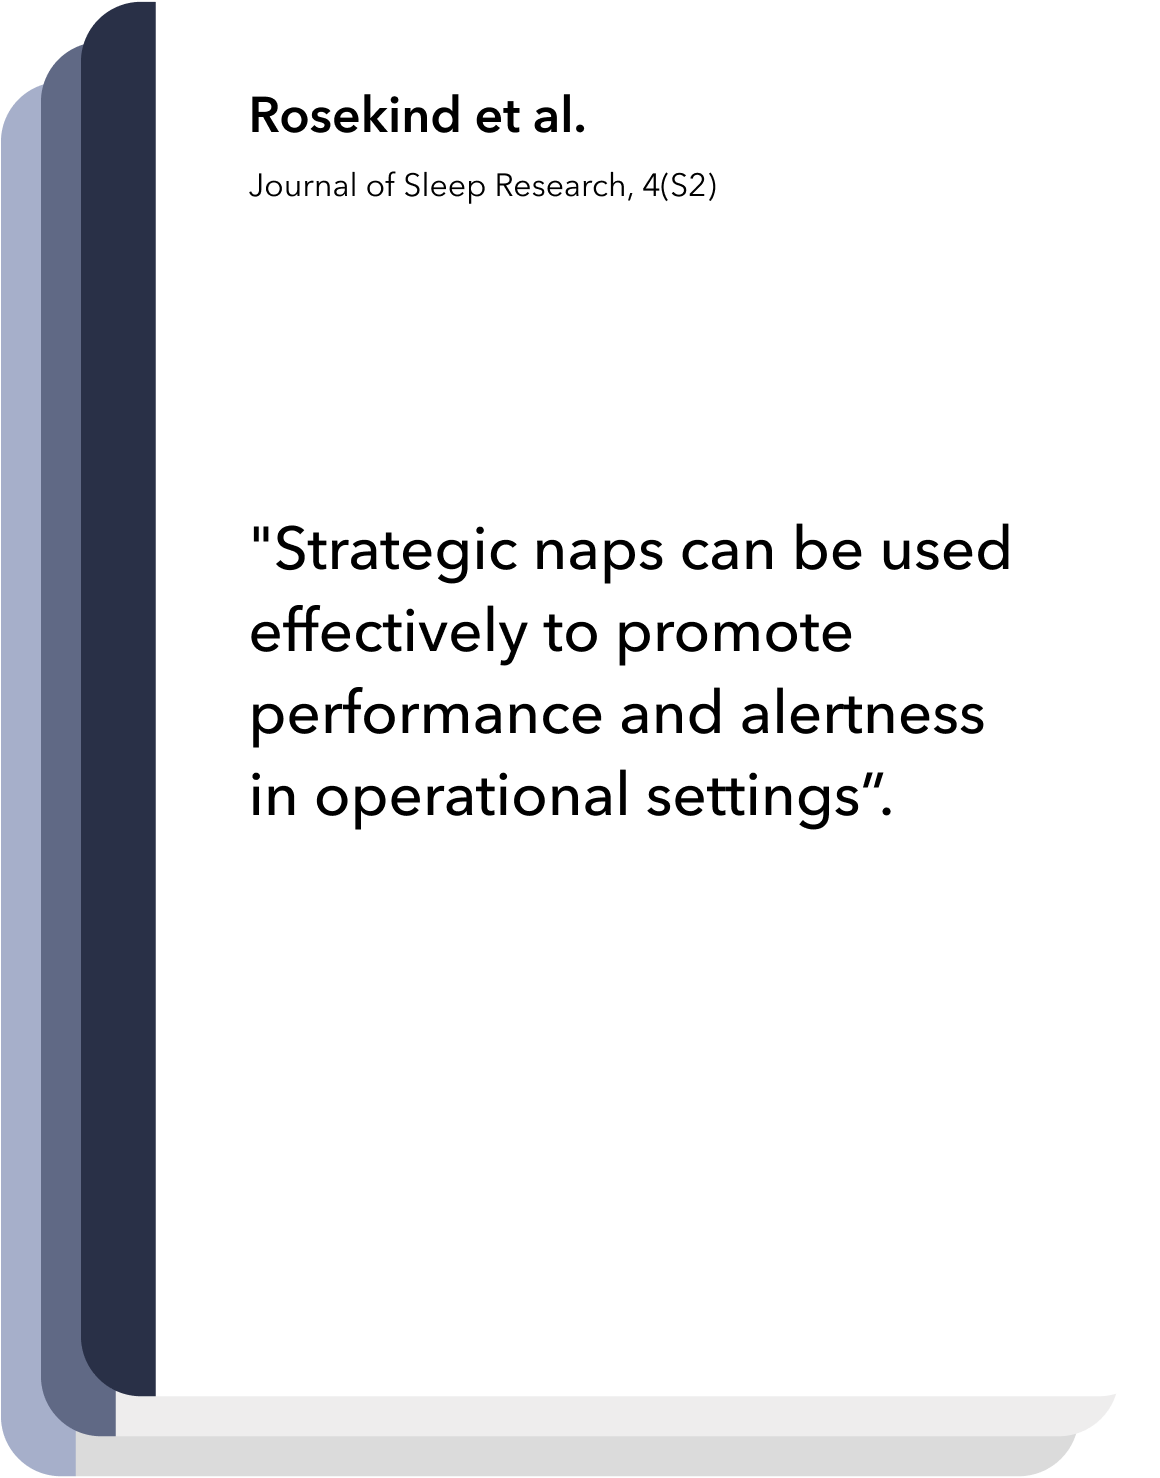 Latest research in sleep and circadian neuroscience: Sleep